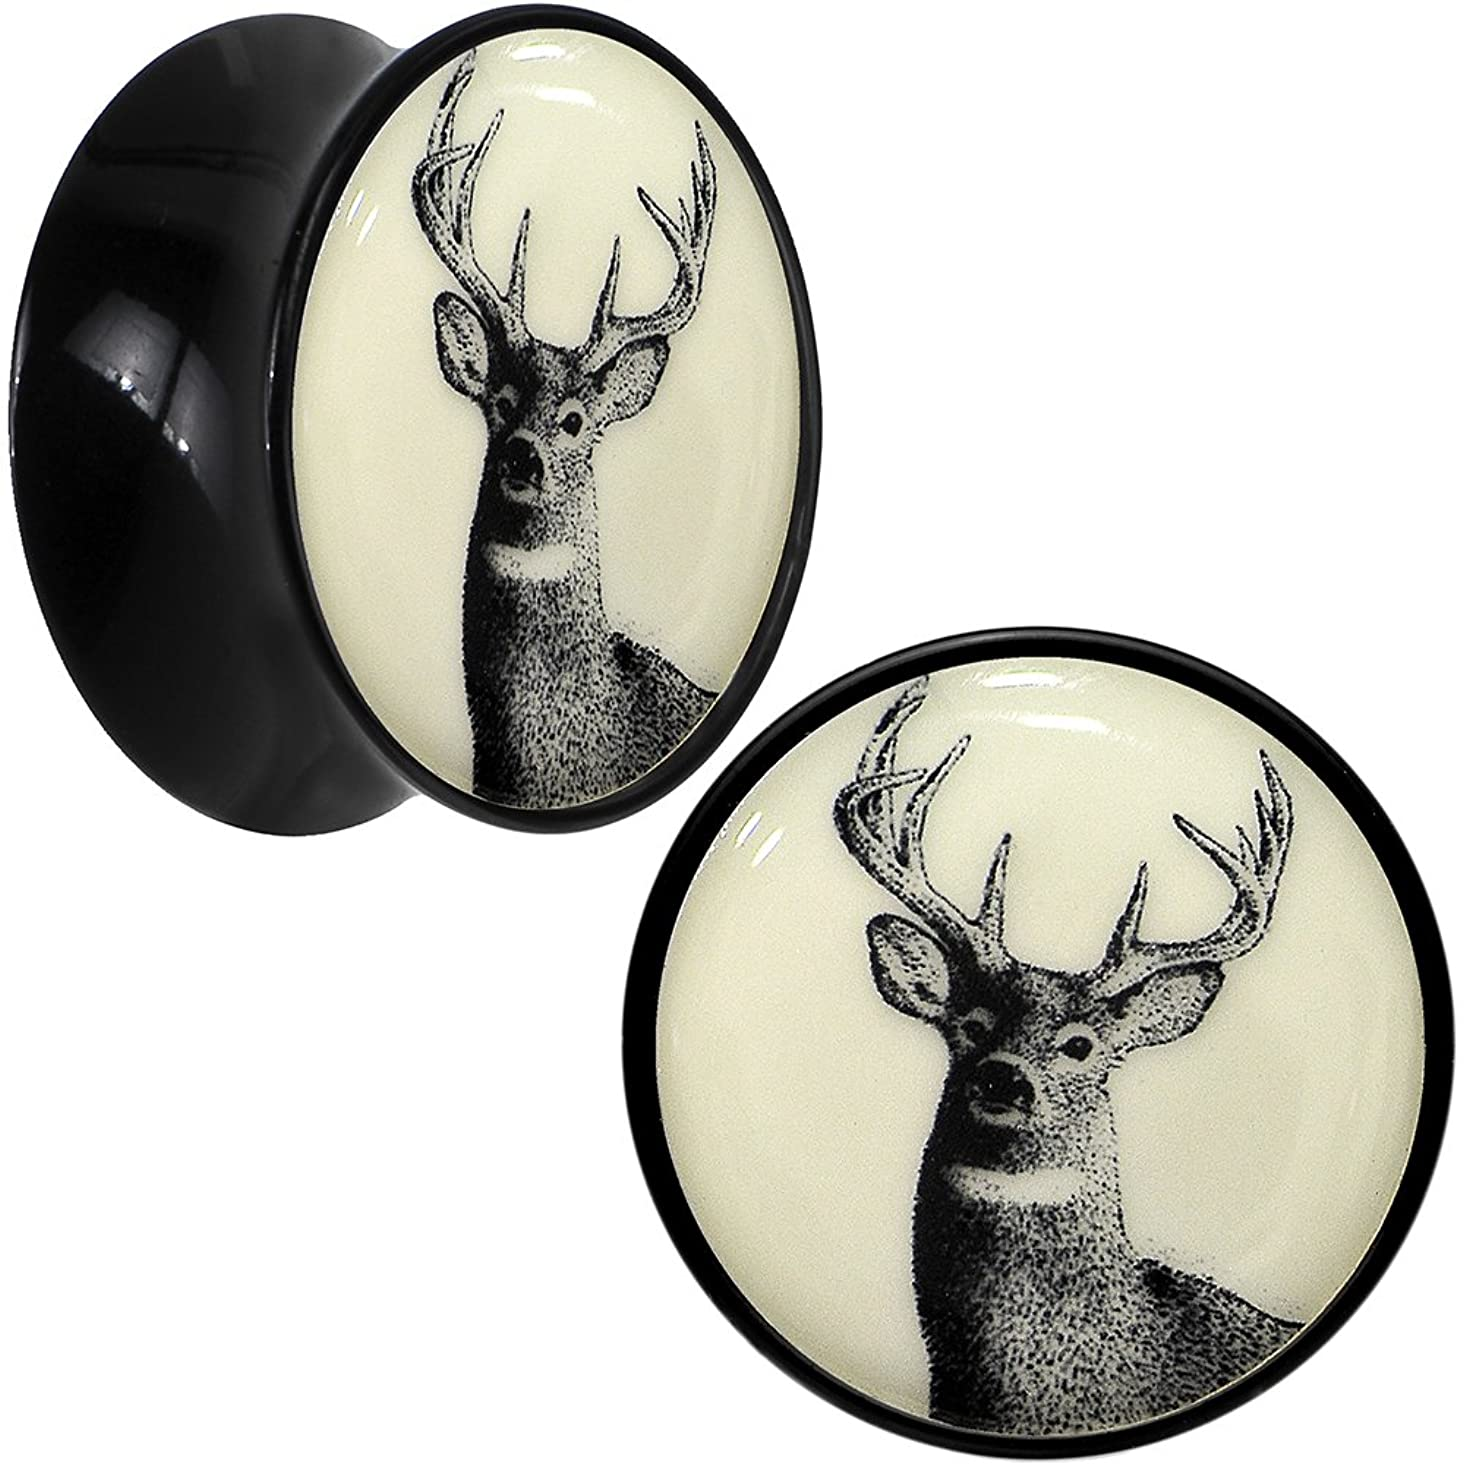 Body Candy Black Acrylic Buck Deer Glow in The Dark Saddle Ear Gauge Plug Pair 18mm